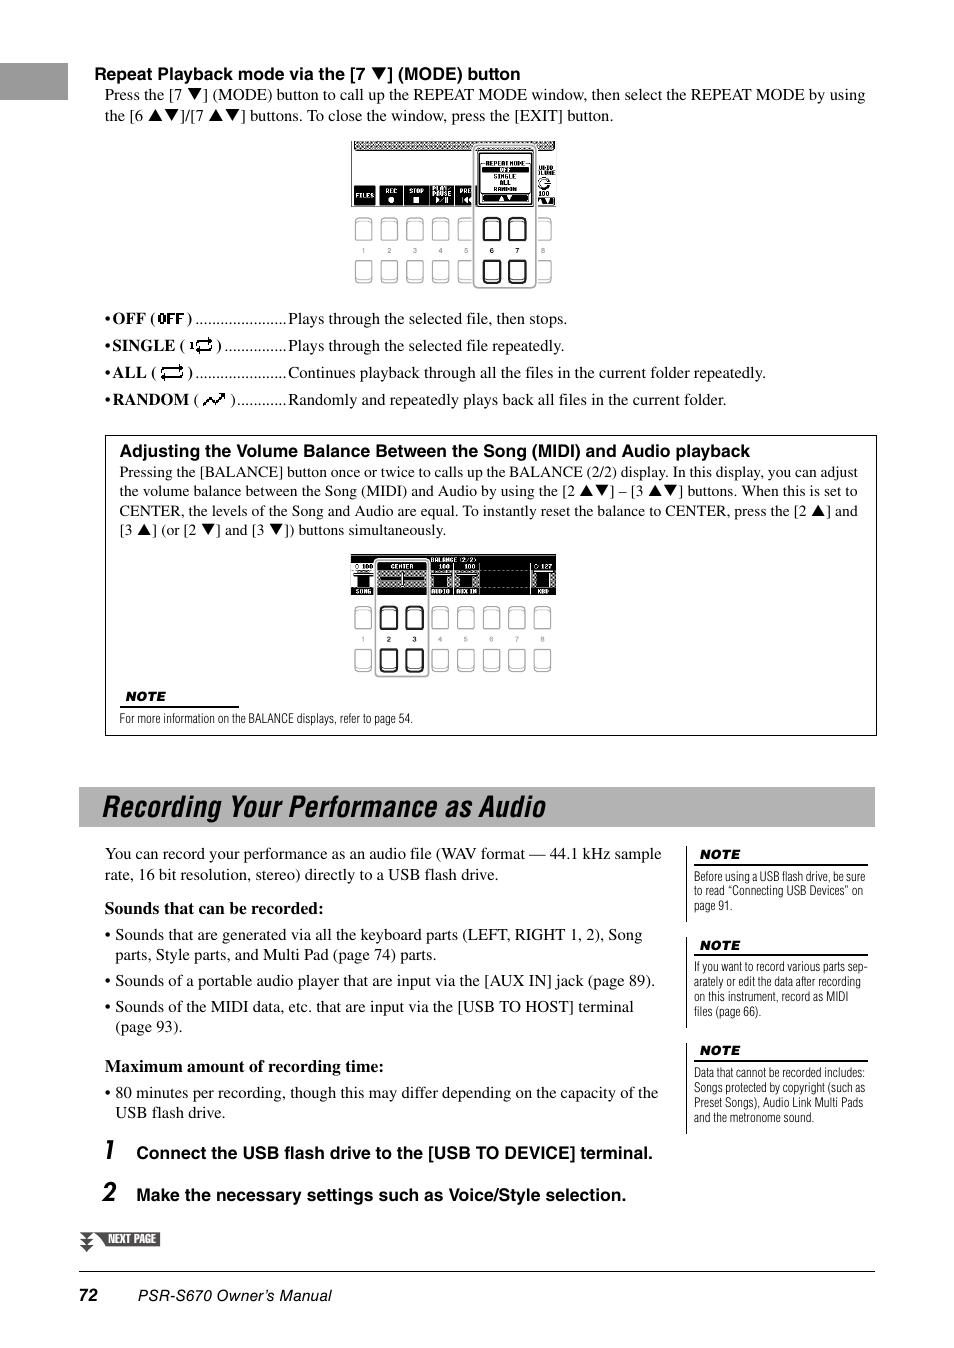 recording your performance as audio yamaha psr s670 user manual rh manualsdir com Manual Camera Settings Manual vs TTL Flash